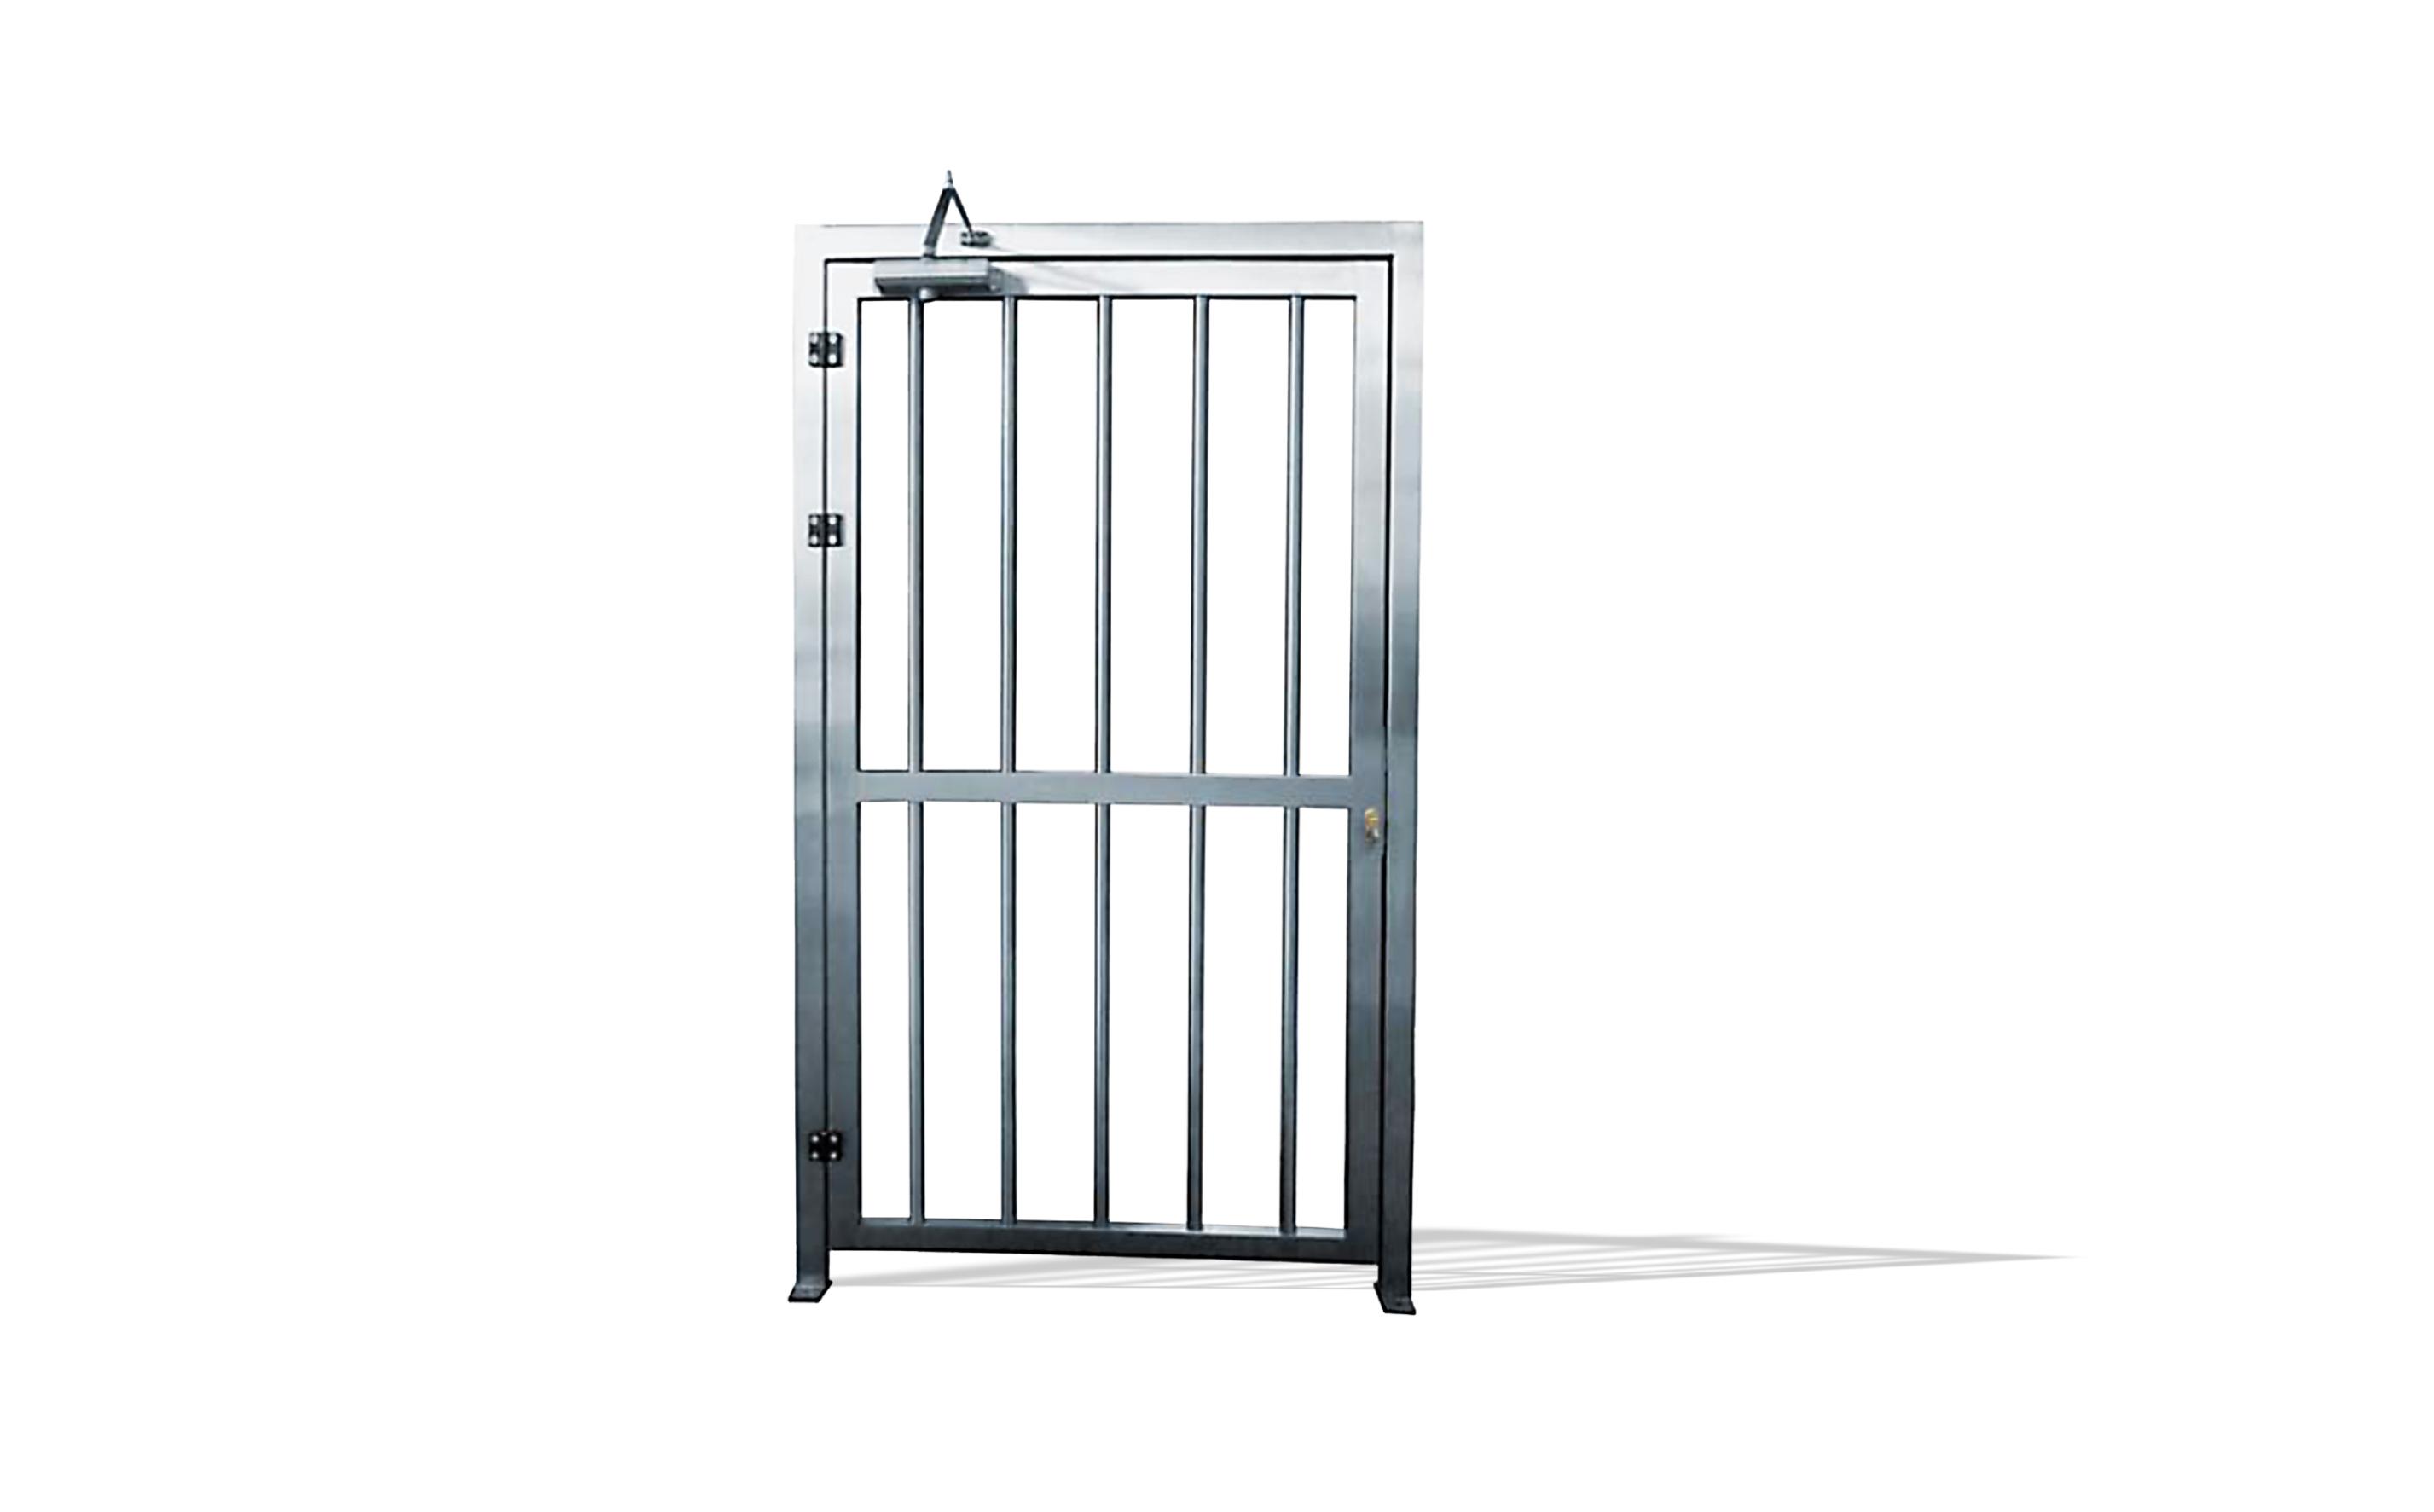 Gates and Gate Operators